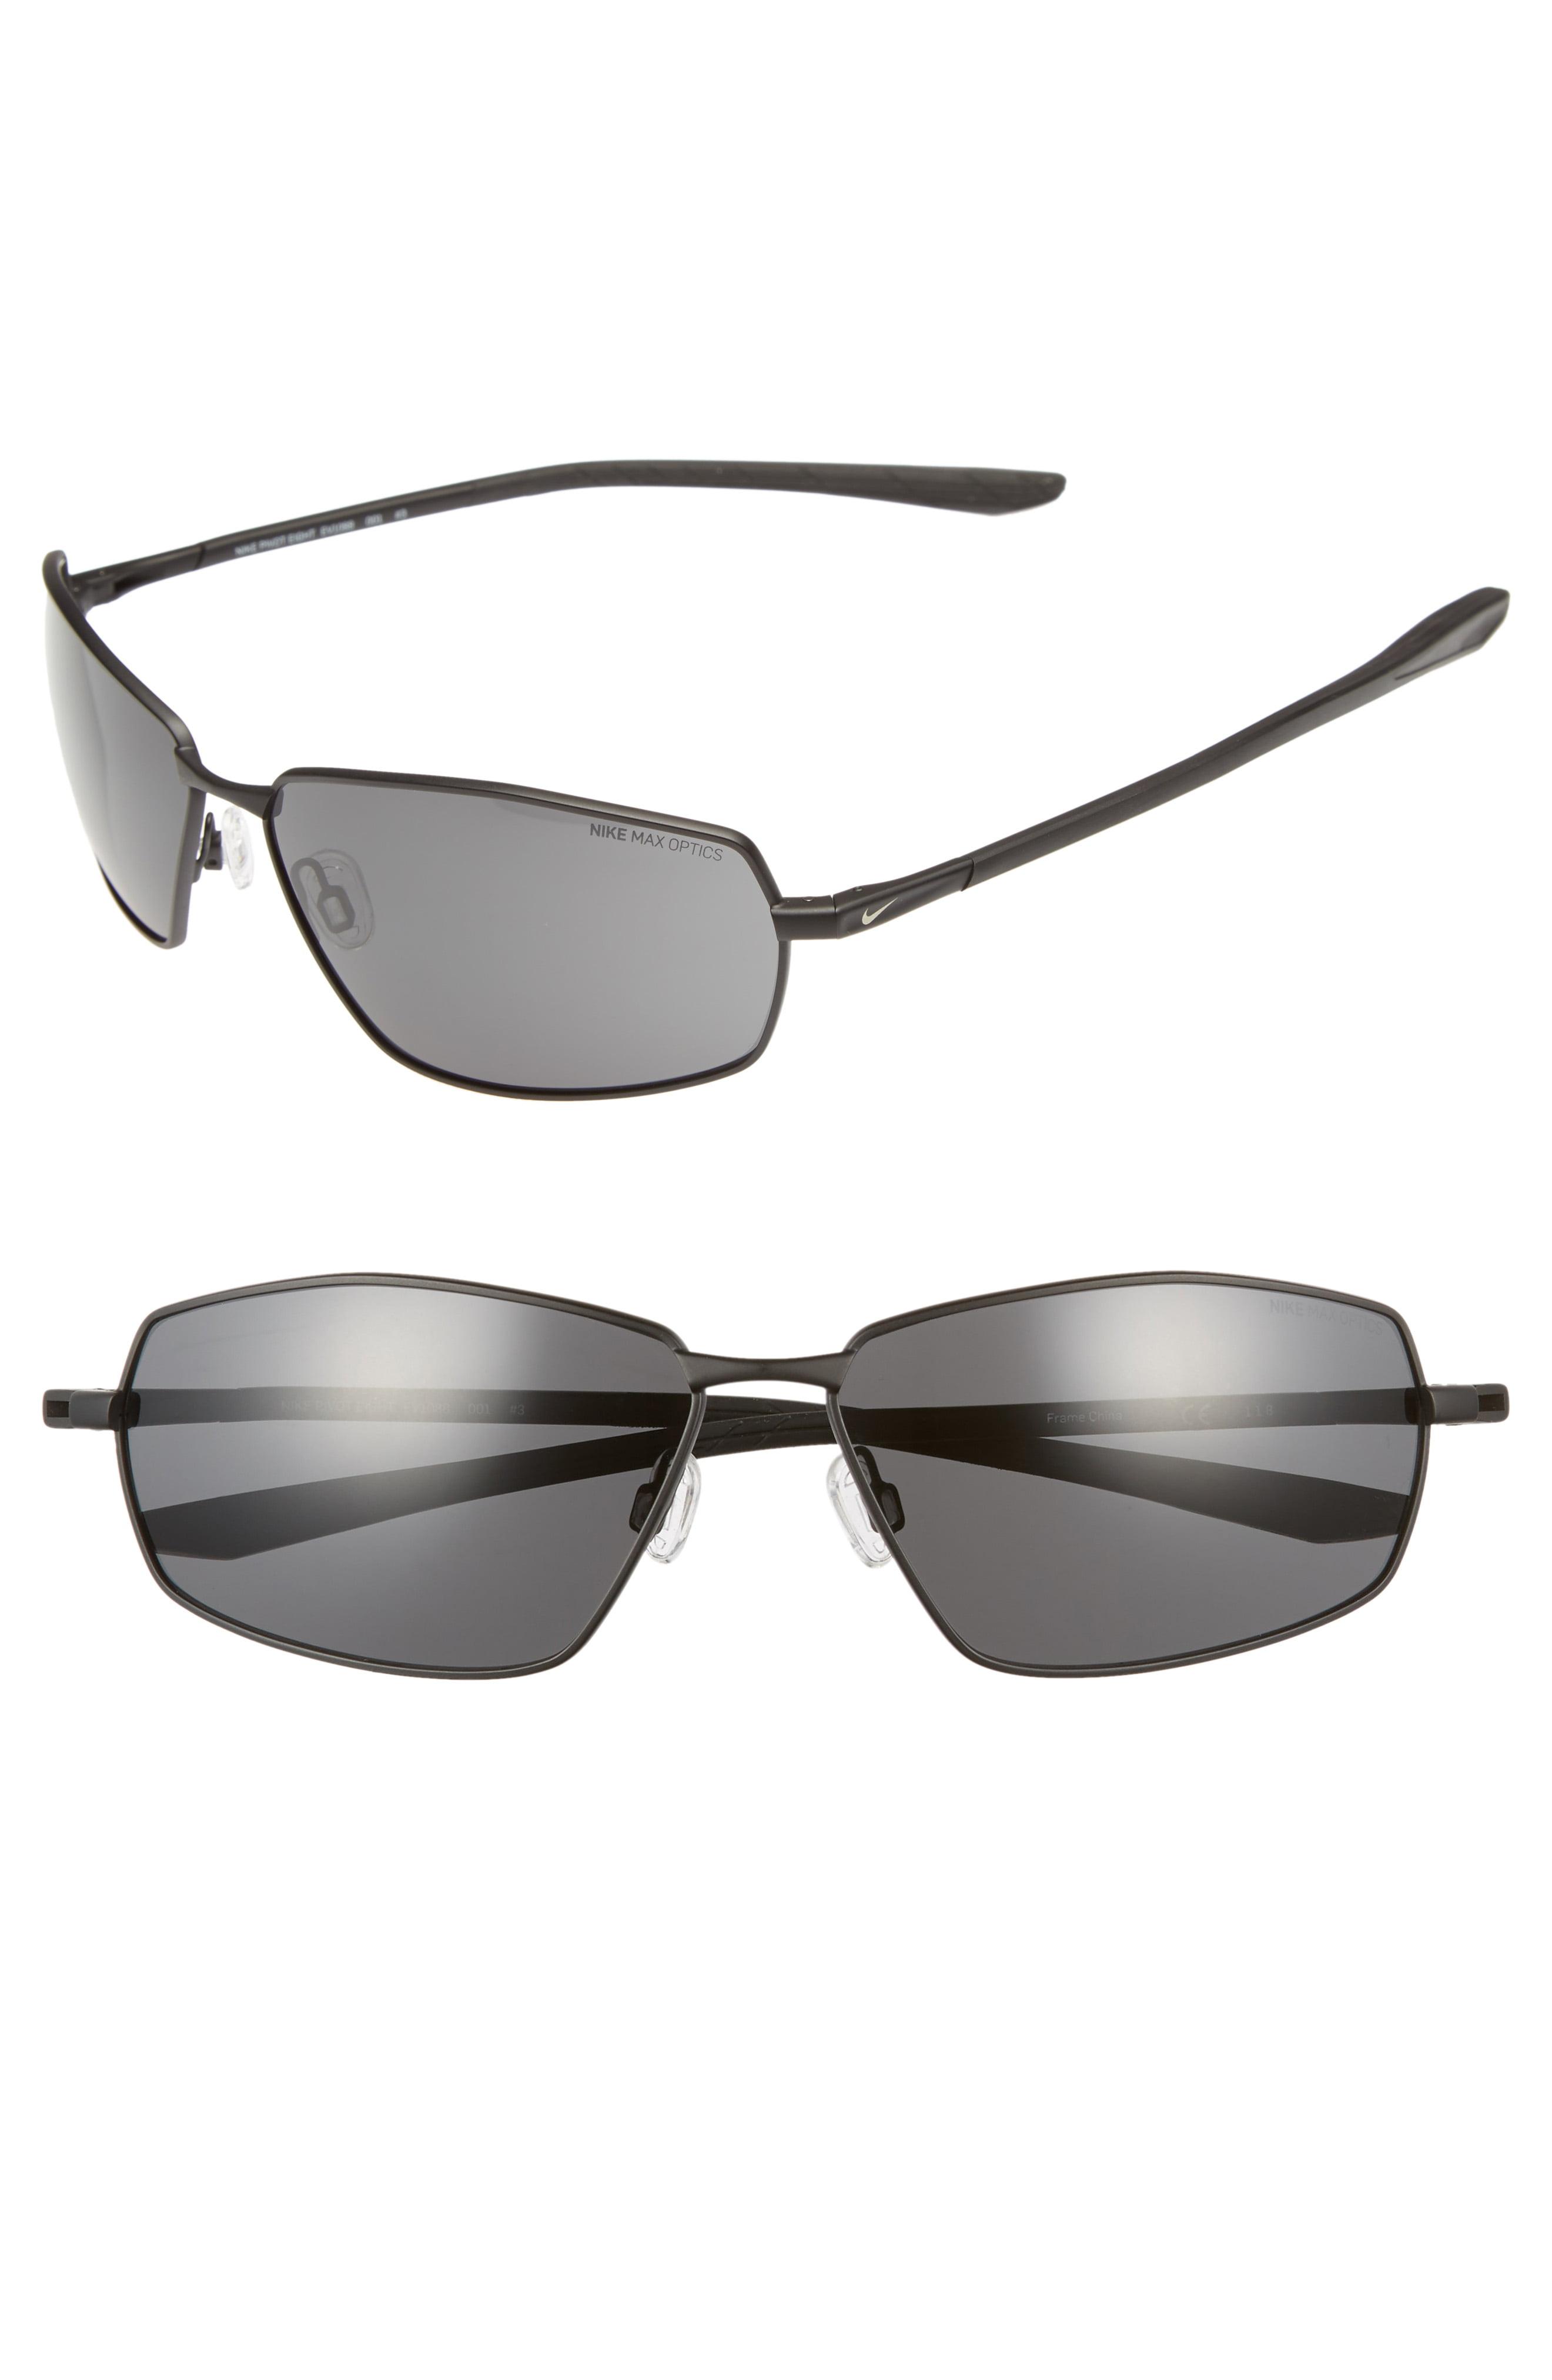 4136d8c87 Men's Nike Pivot Eight 63Mm Oversize Sunglasses - Satin Black/ Dark Grey